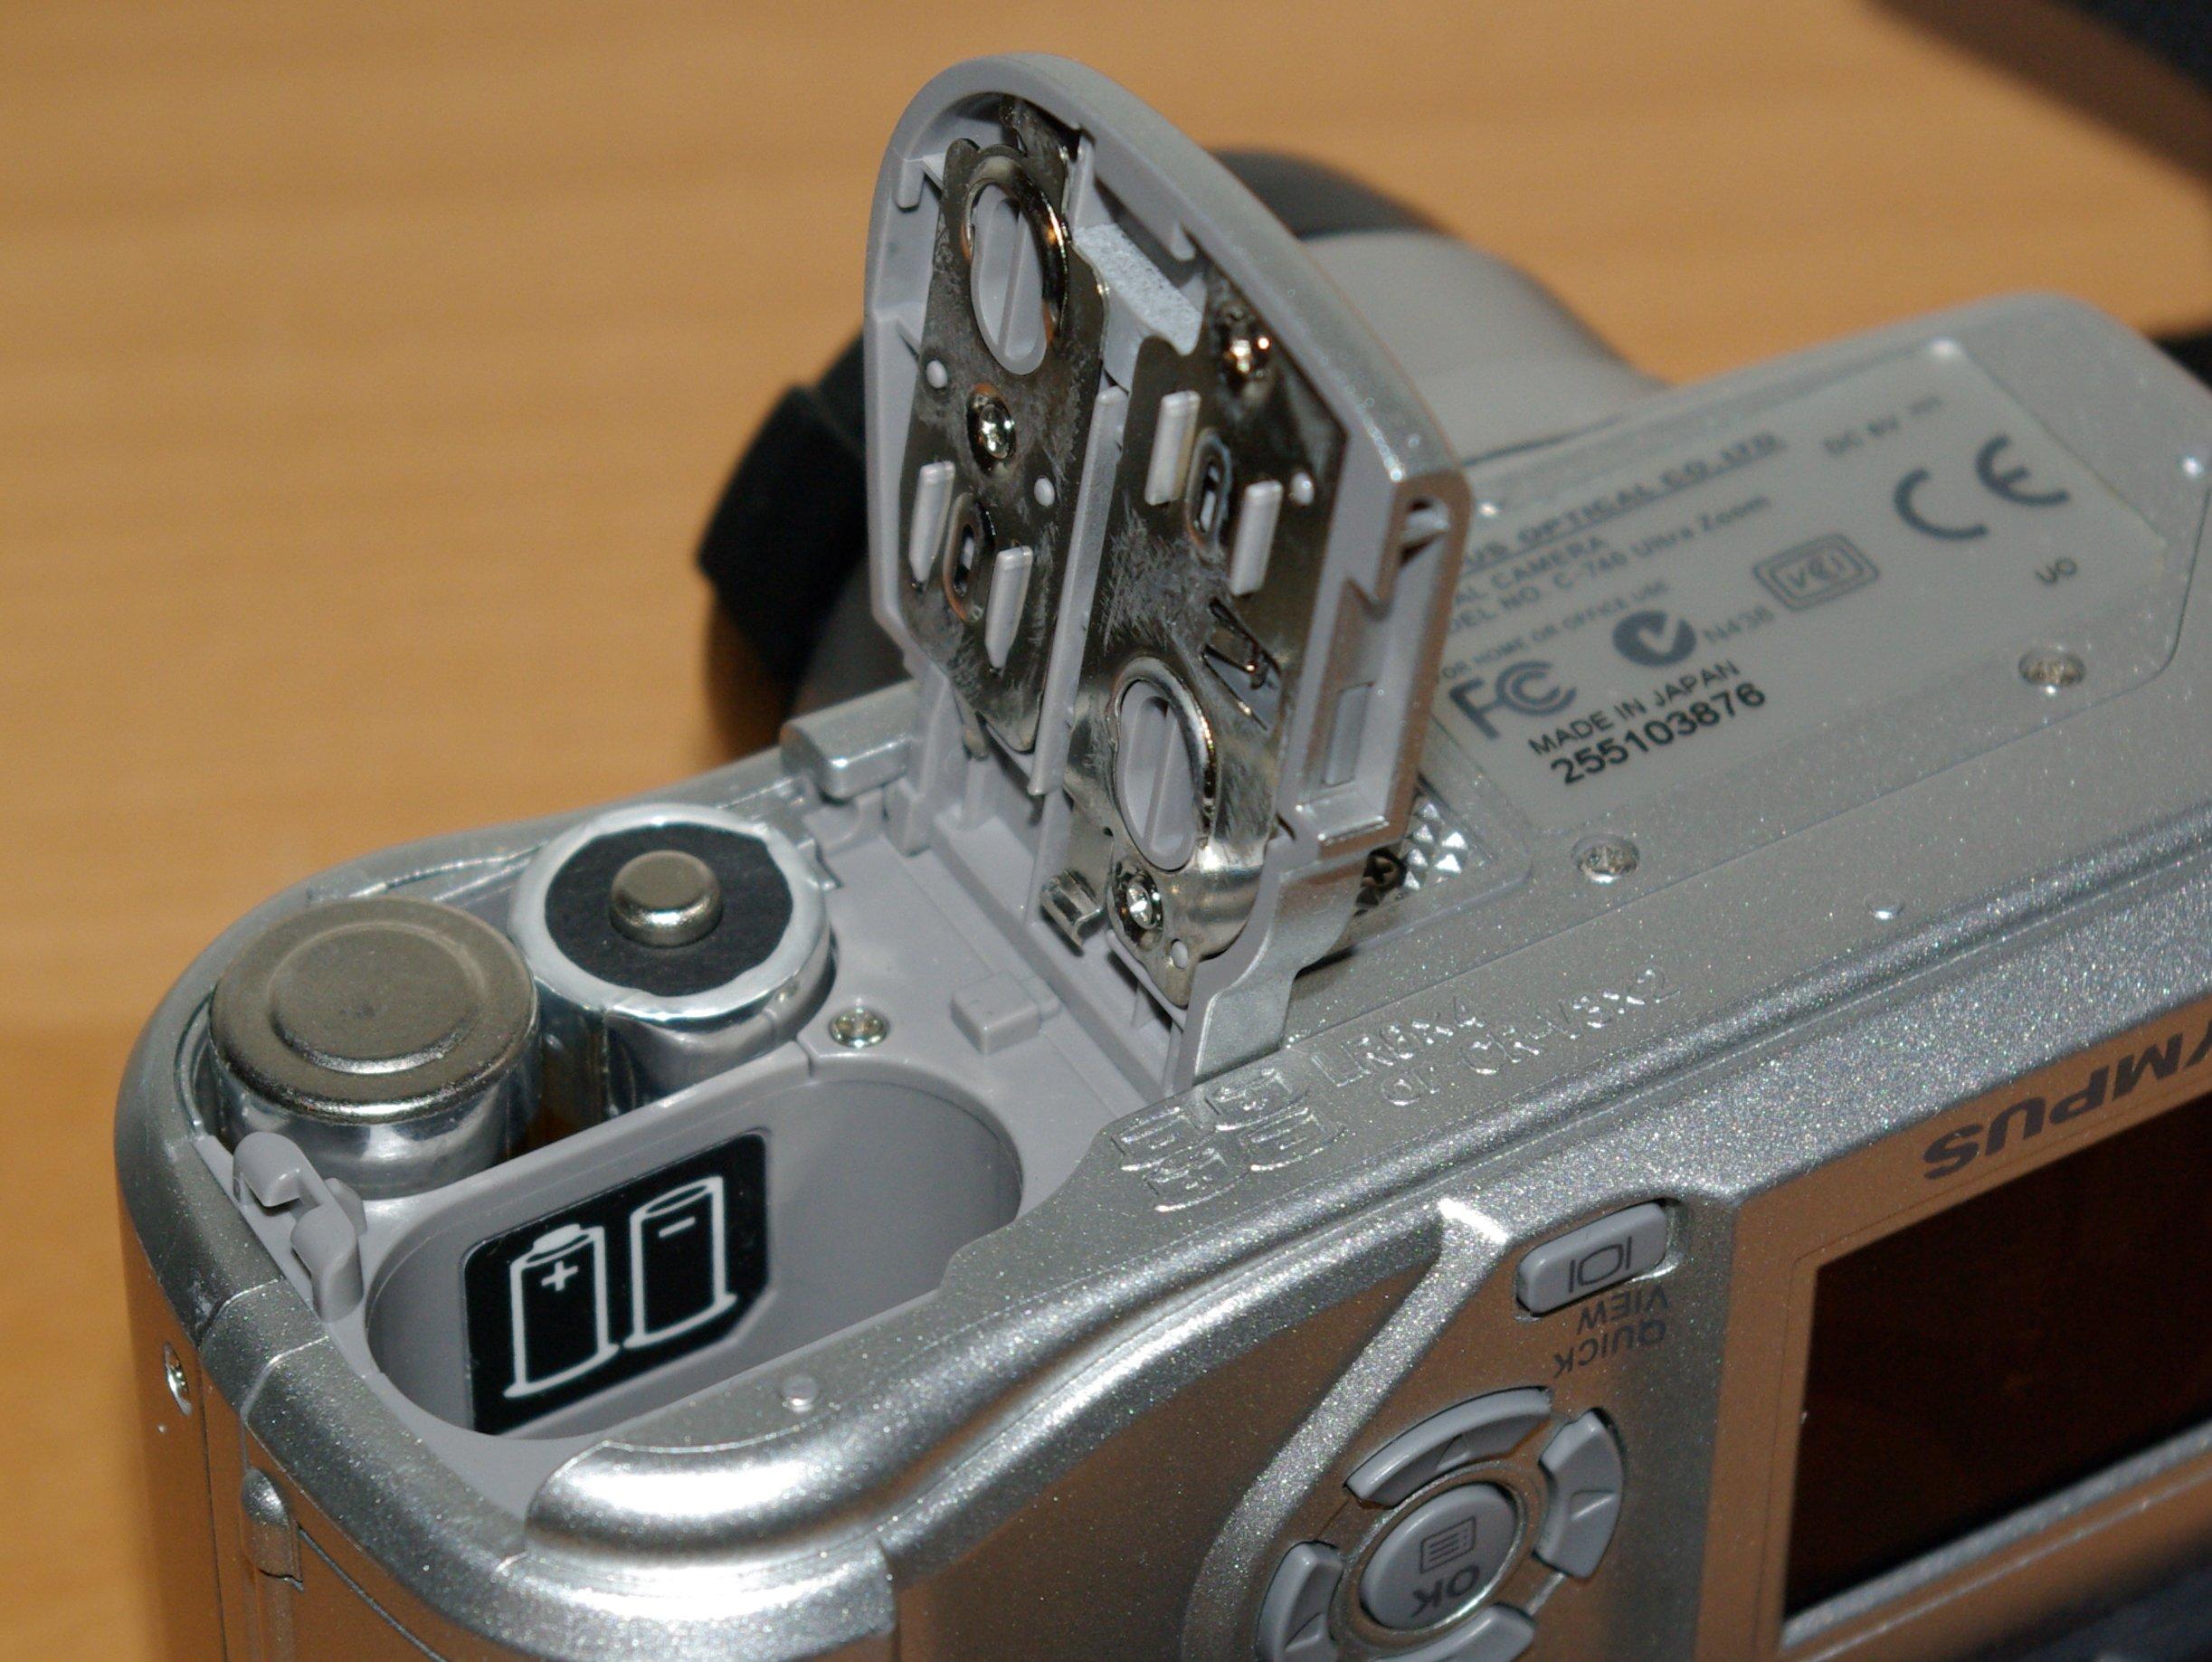 Global Digital Cameras Li-ion Battery Market 2020 Industry ...